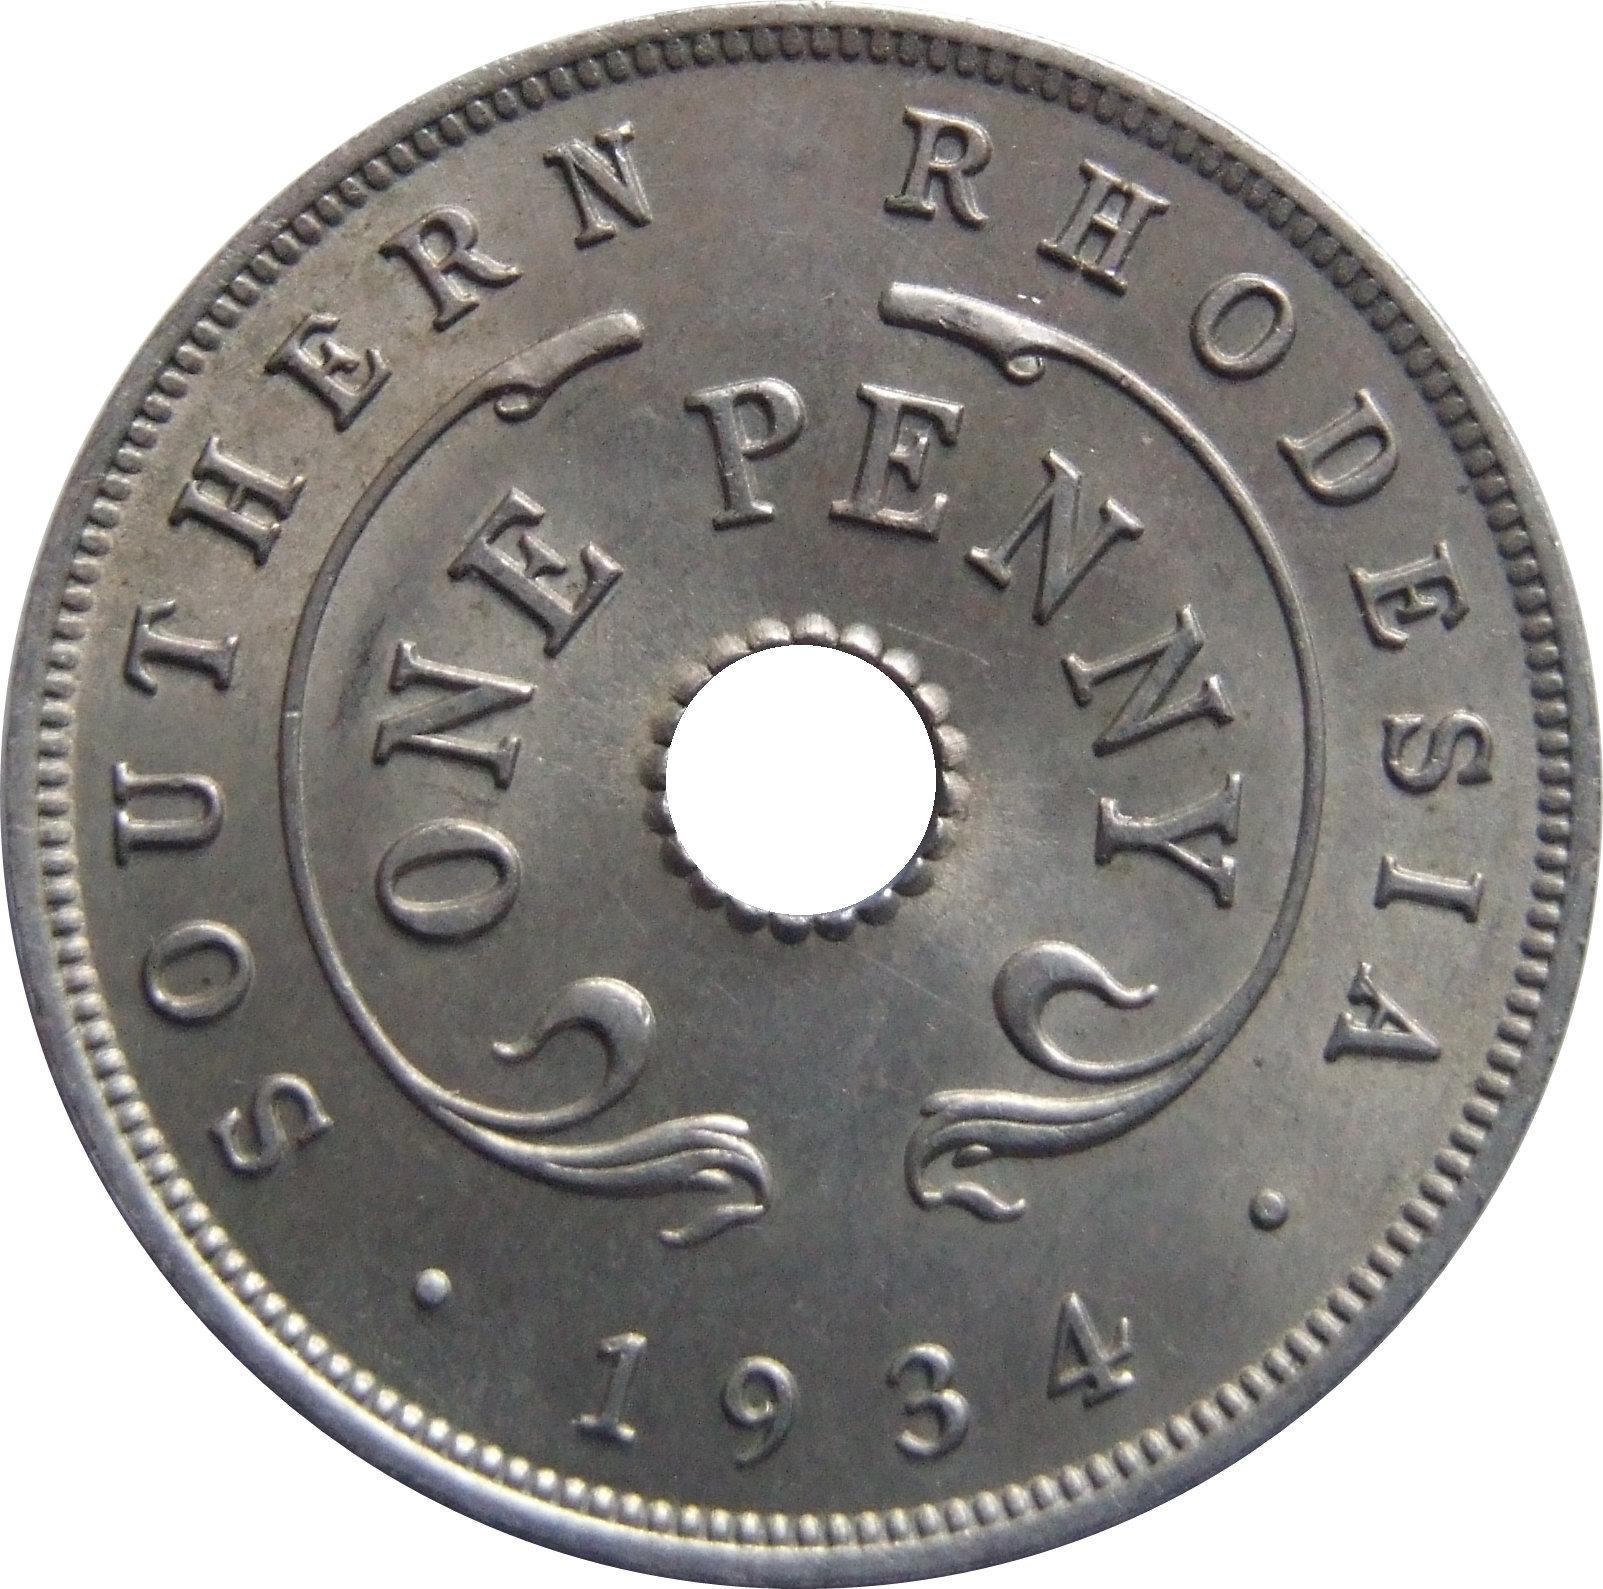 1 Penny - George V - Southern Rhodesia – Numista